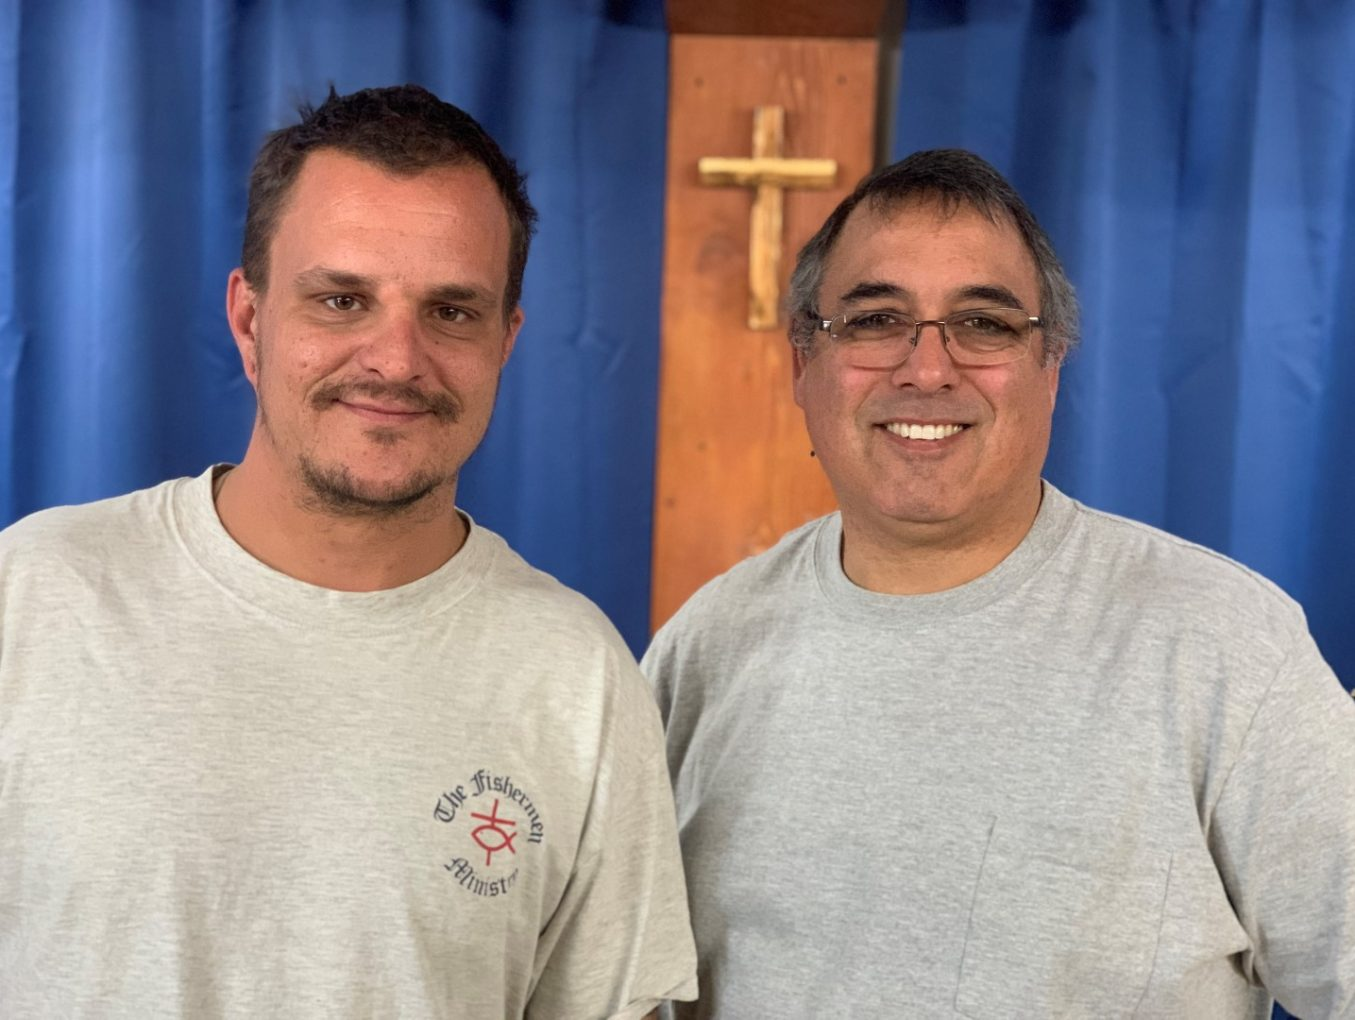 Texas Sunday Service 2019-12-15